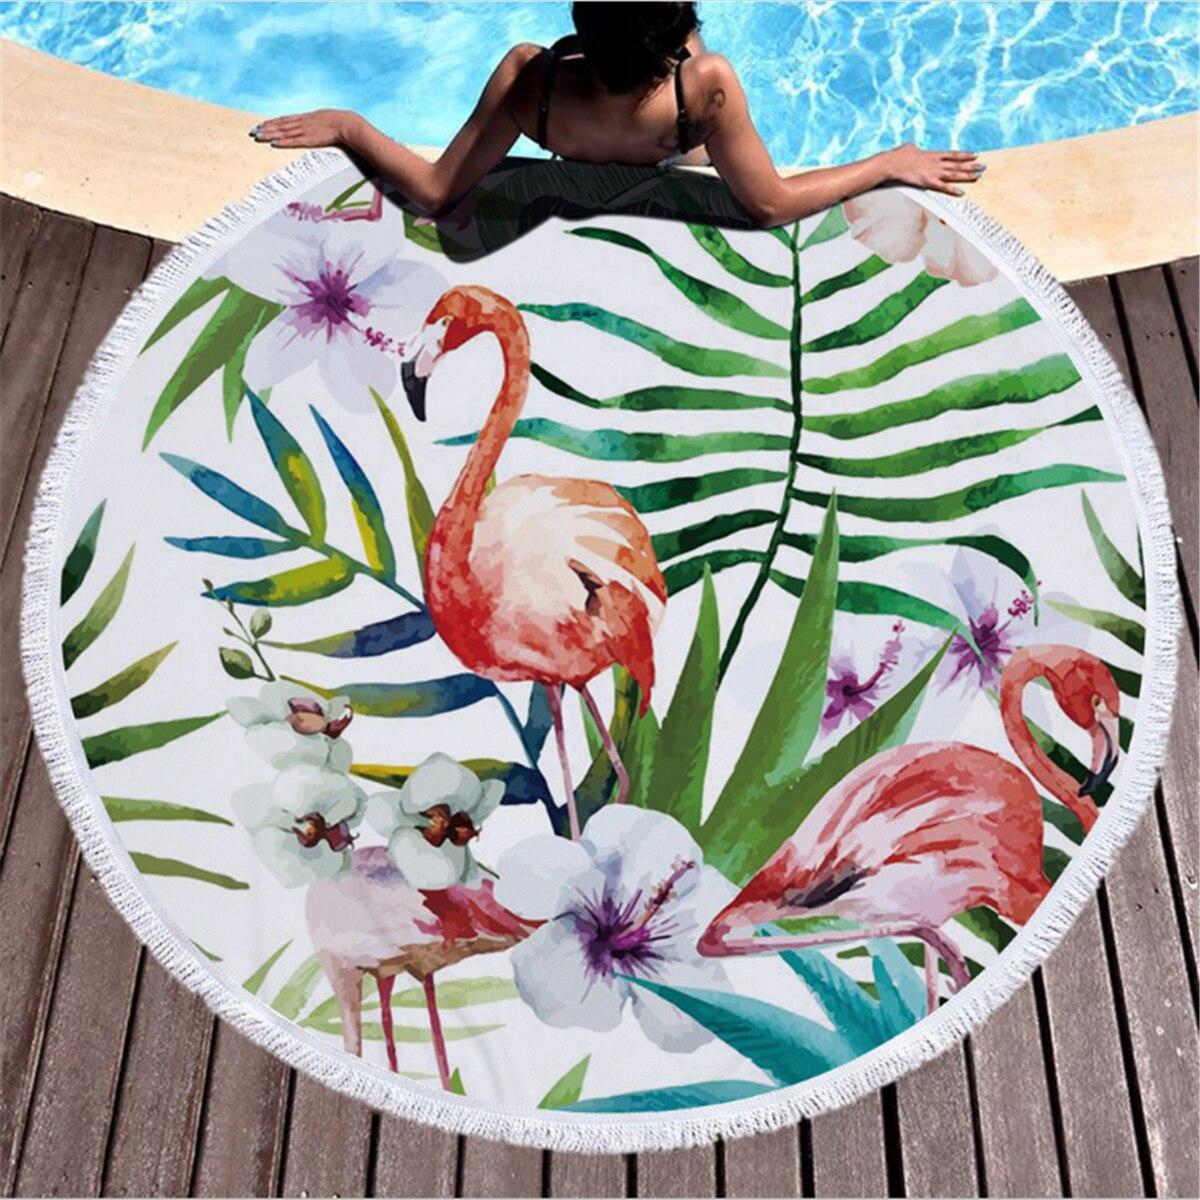 Summer Indian Flamingos Mandala Beach Towels Wall Hanging Tapestry with Tassel Bedspread Yoga Mat Blanket 150cm Home Decoration